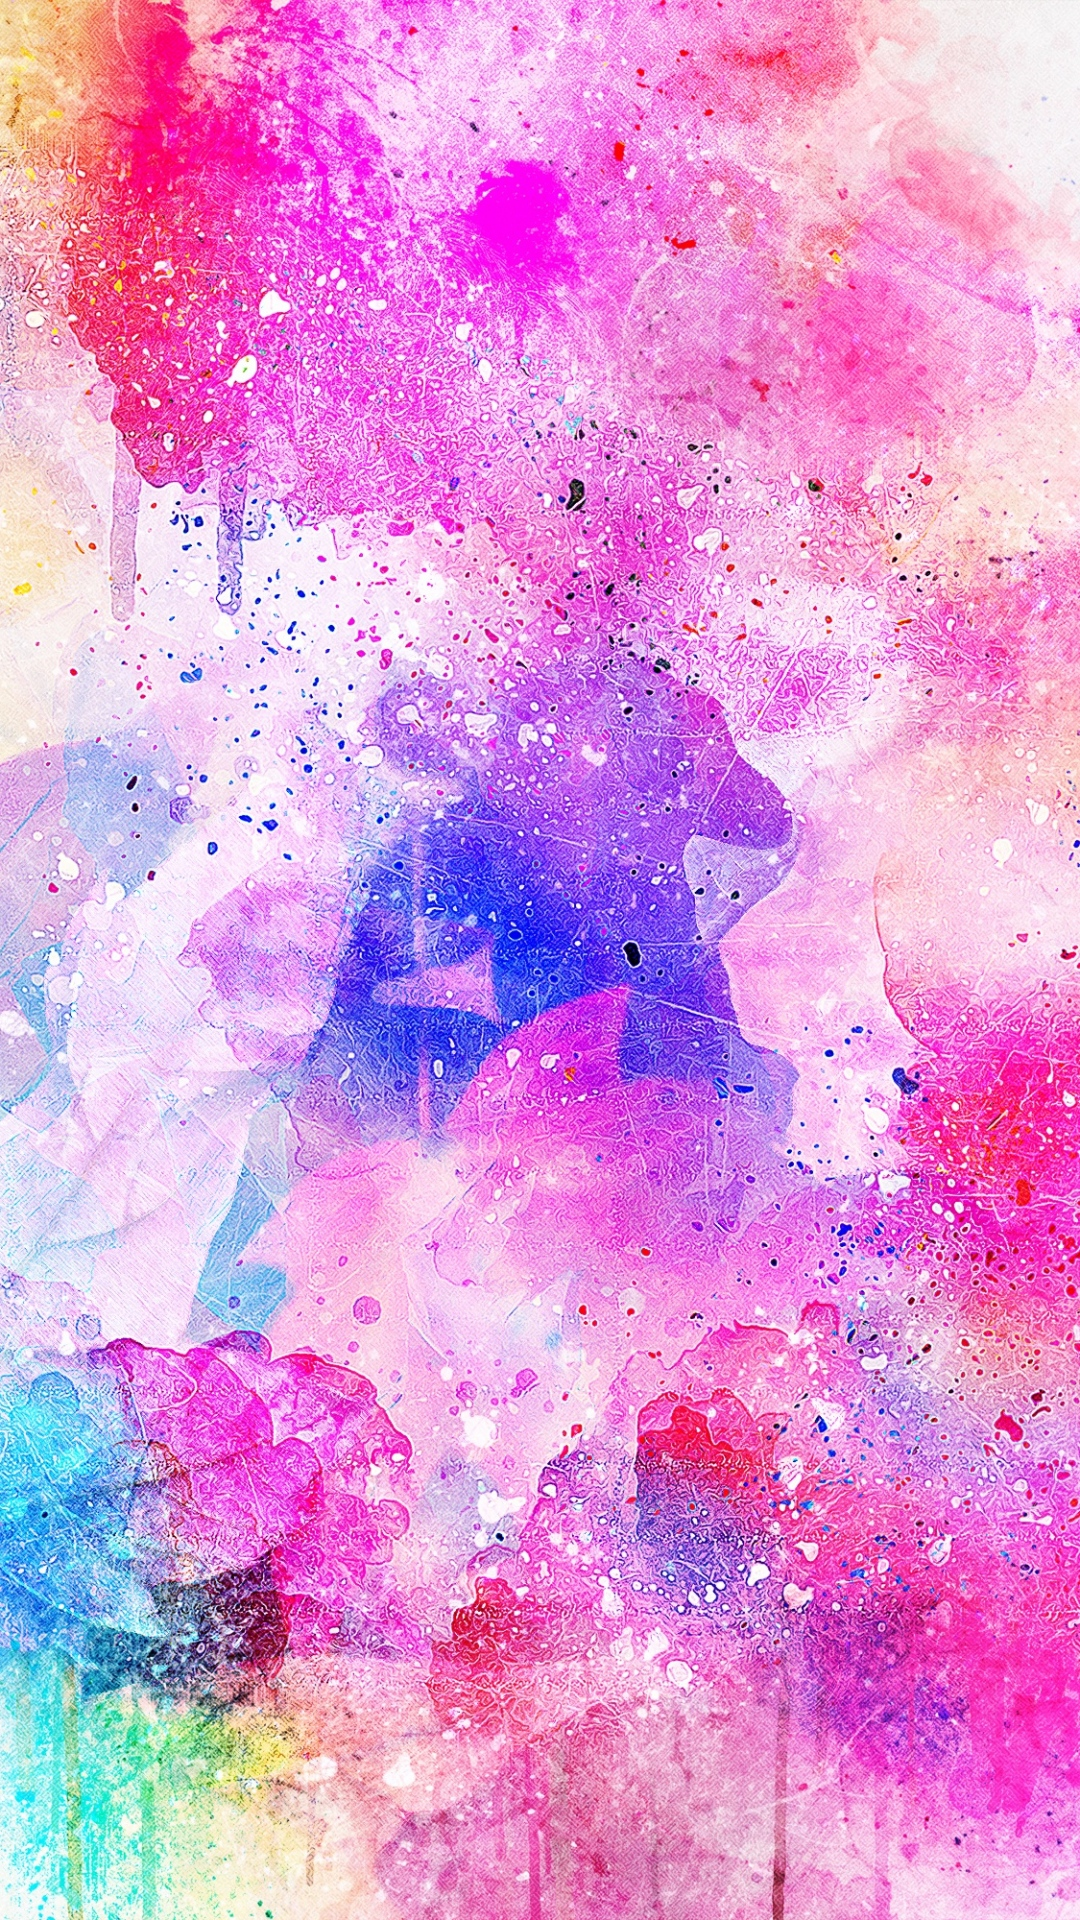 iphone wallpaper watercolor spots bright pink Watercolor